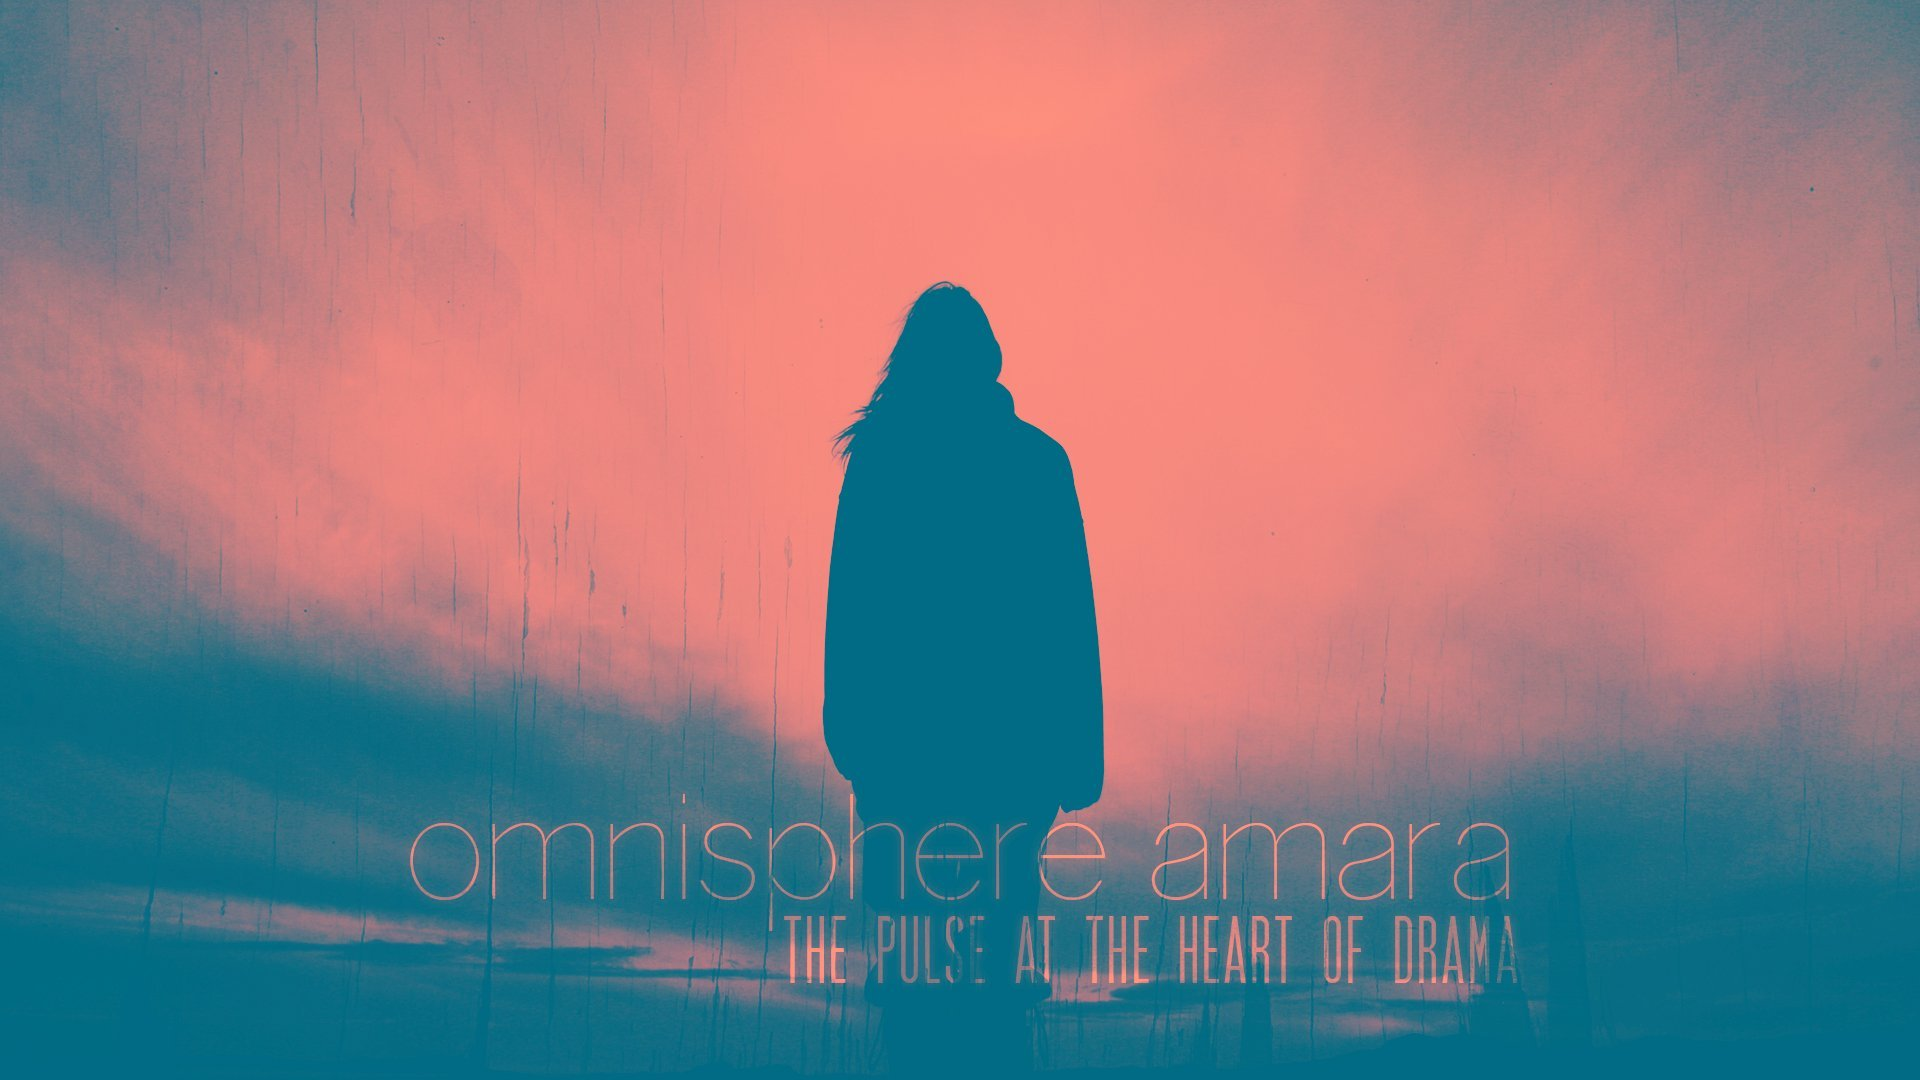 Omnisphere Amara offers modern analogue synths & organic sound design